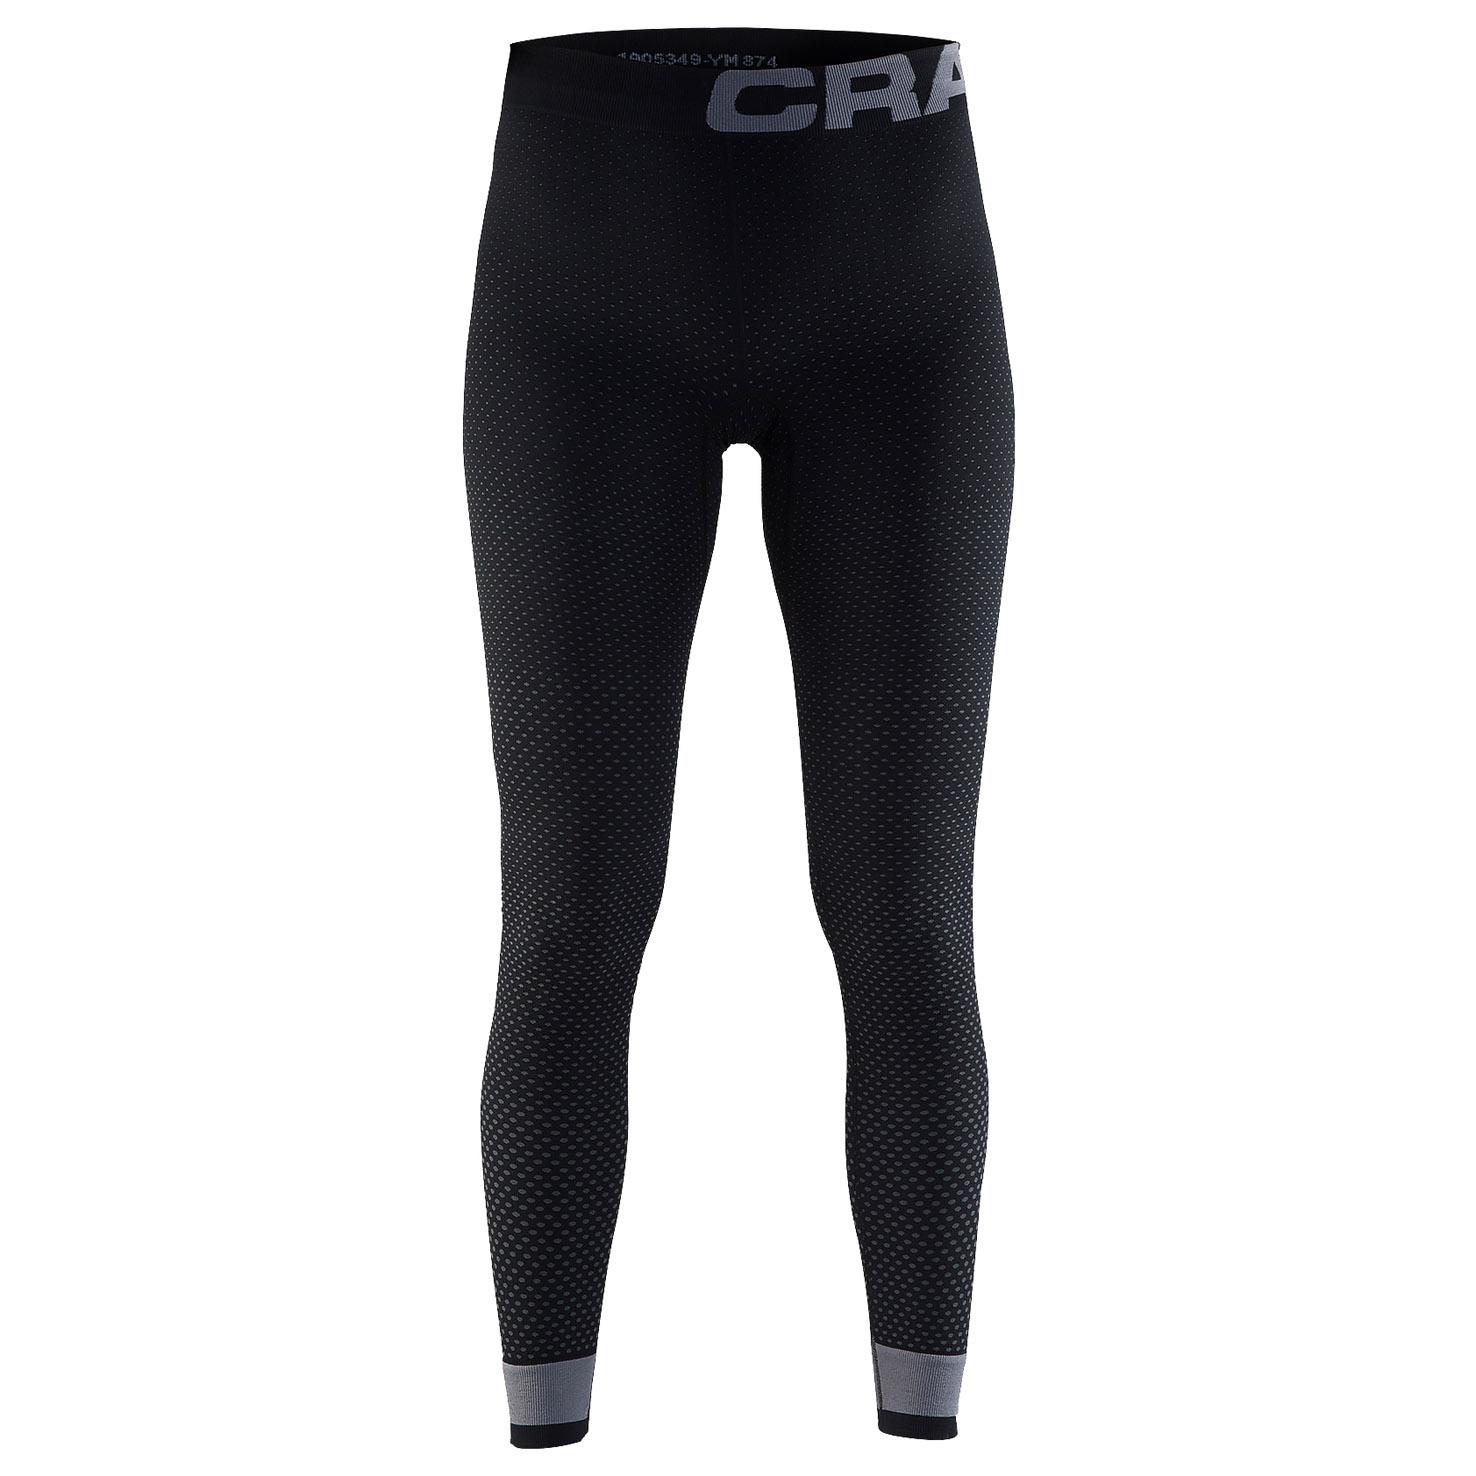 craft warm intensity pants unterhose lang damen schwarz. Black Bedroom Furniture Sets. Home Design Ideas